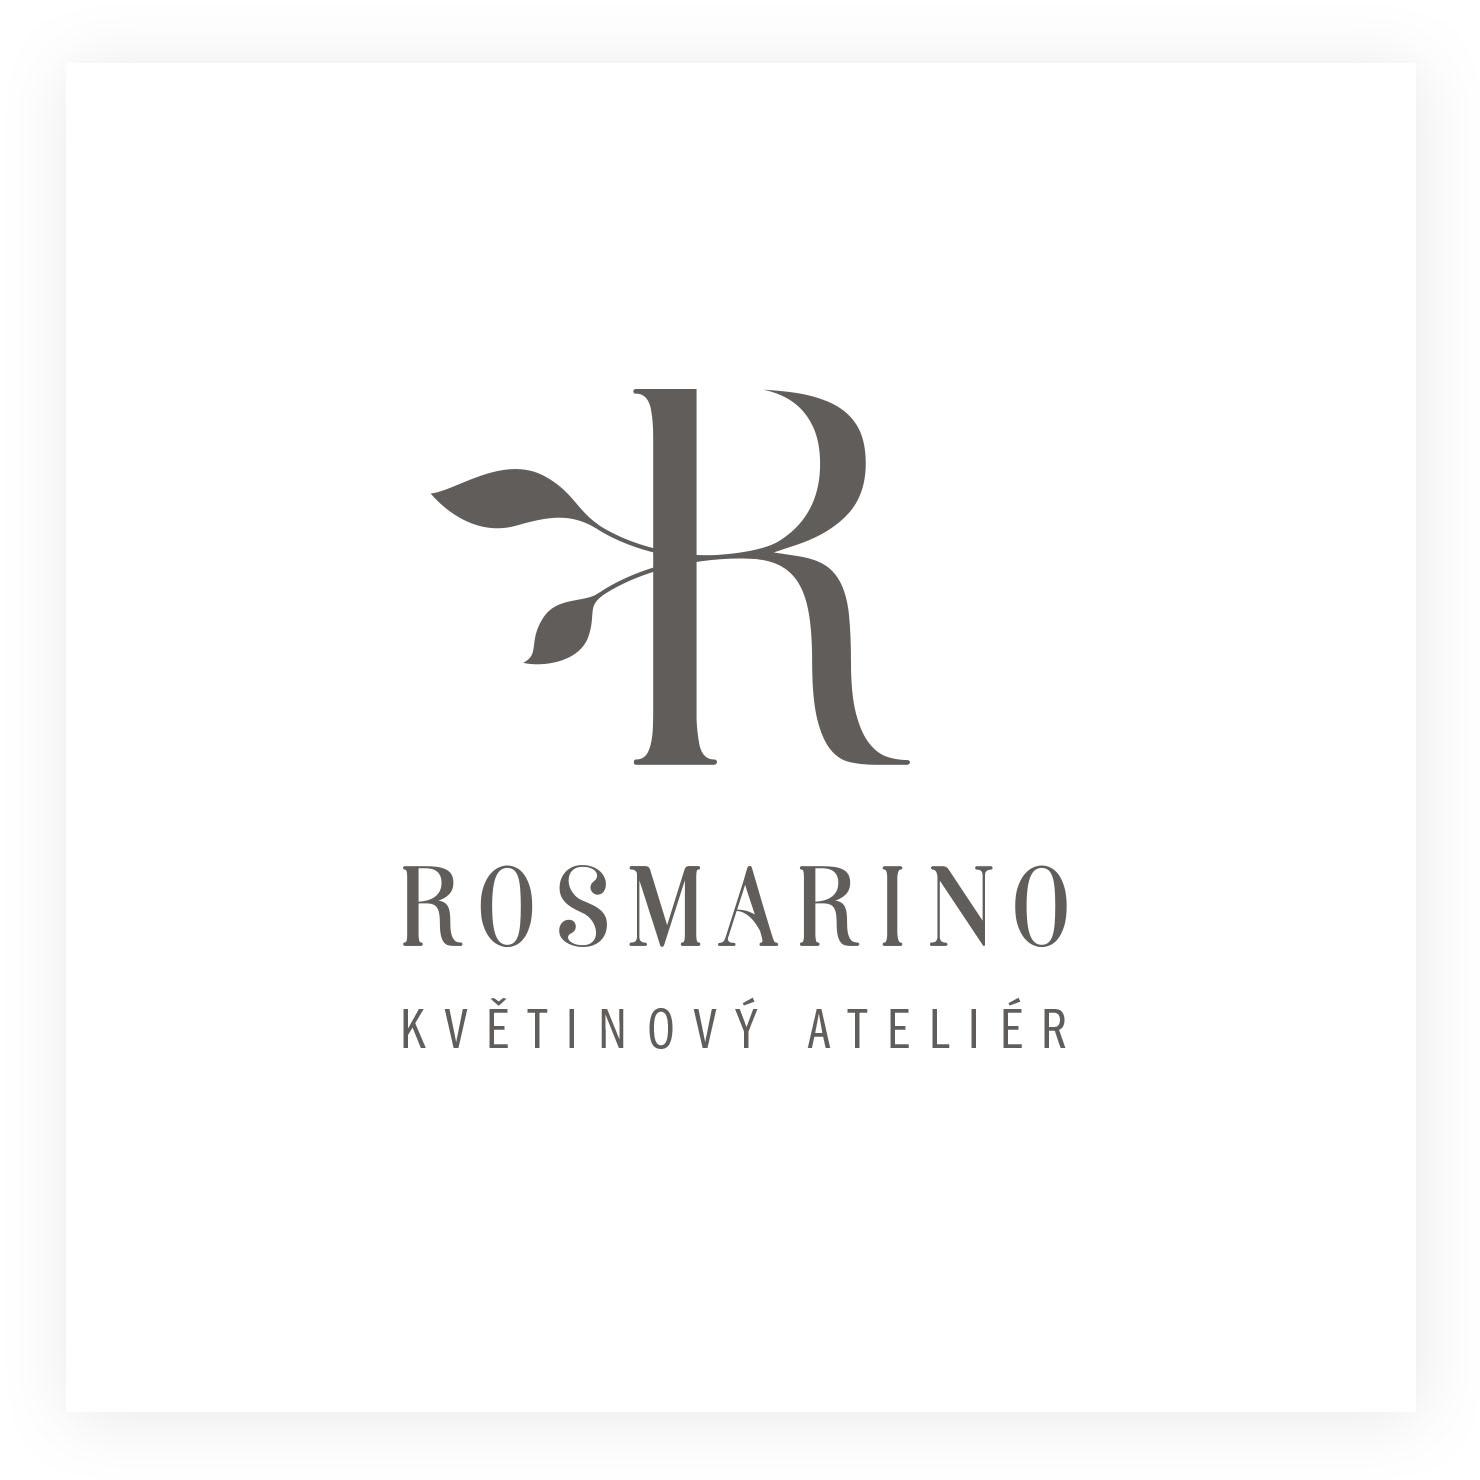 rosmarino_logo1